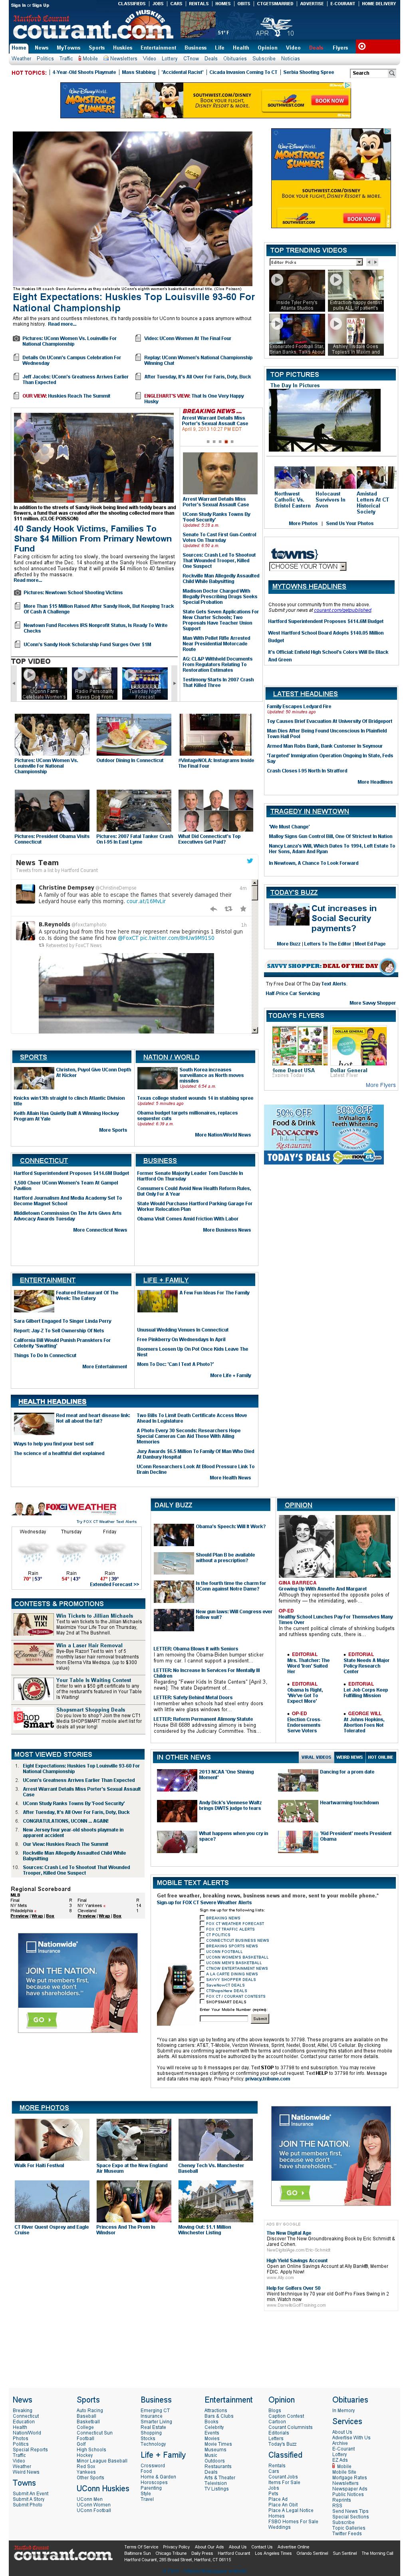 Hartford Courant at Wednesday April 10, 2013, 12:10 p.m. UTC